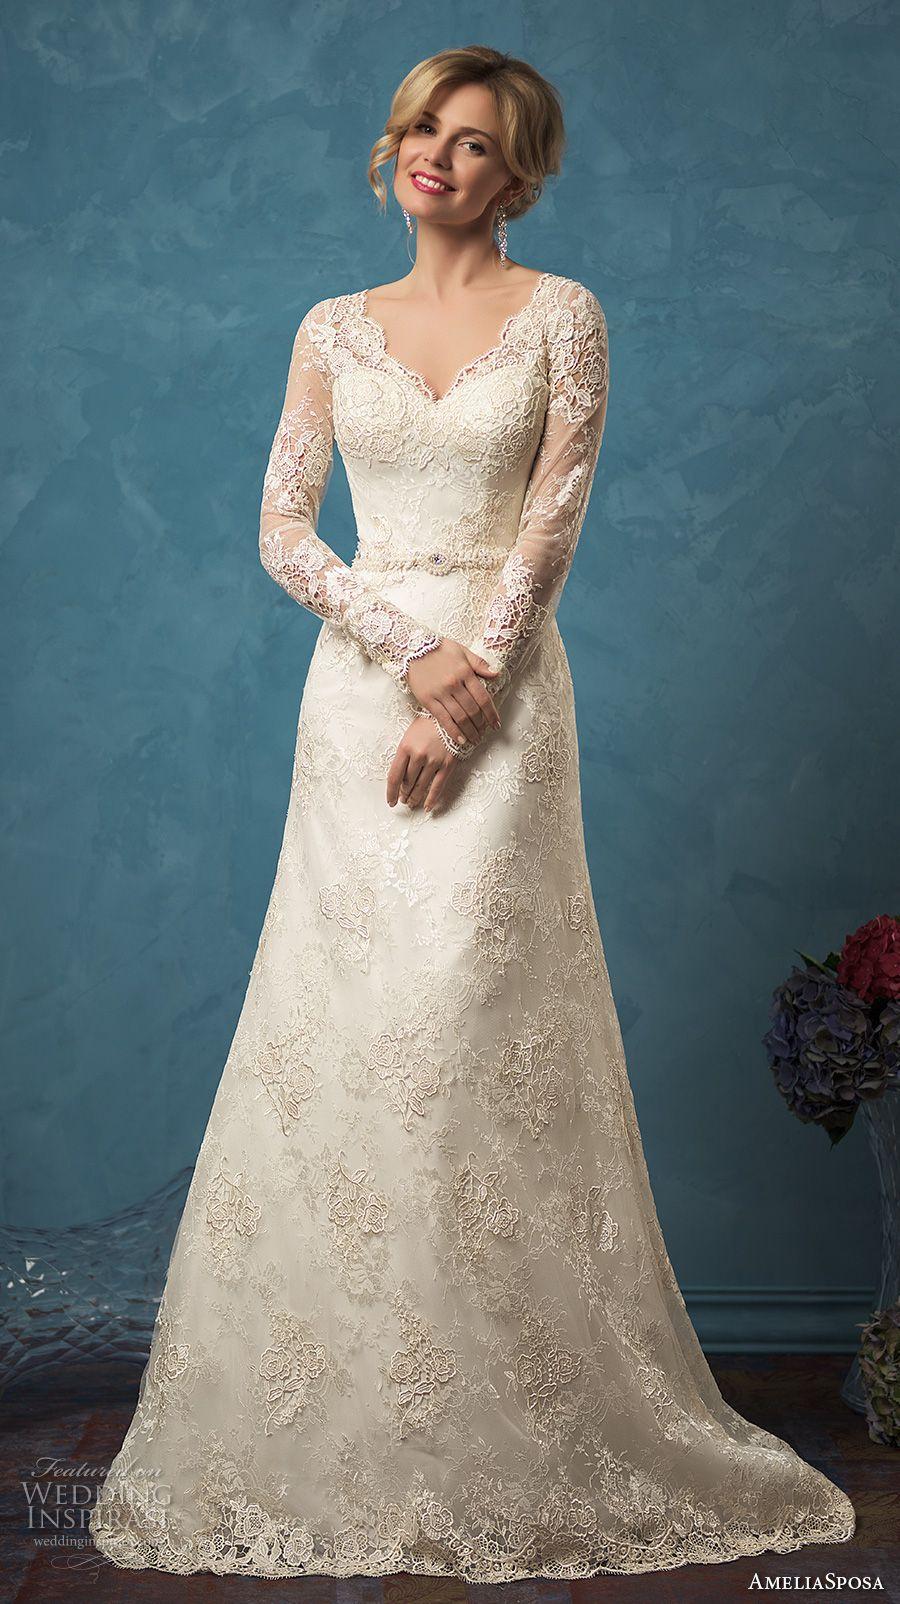 Amelia sposa wedding dresses wedding dress